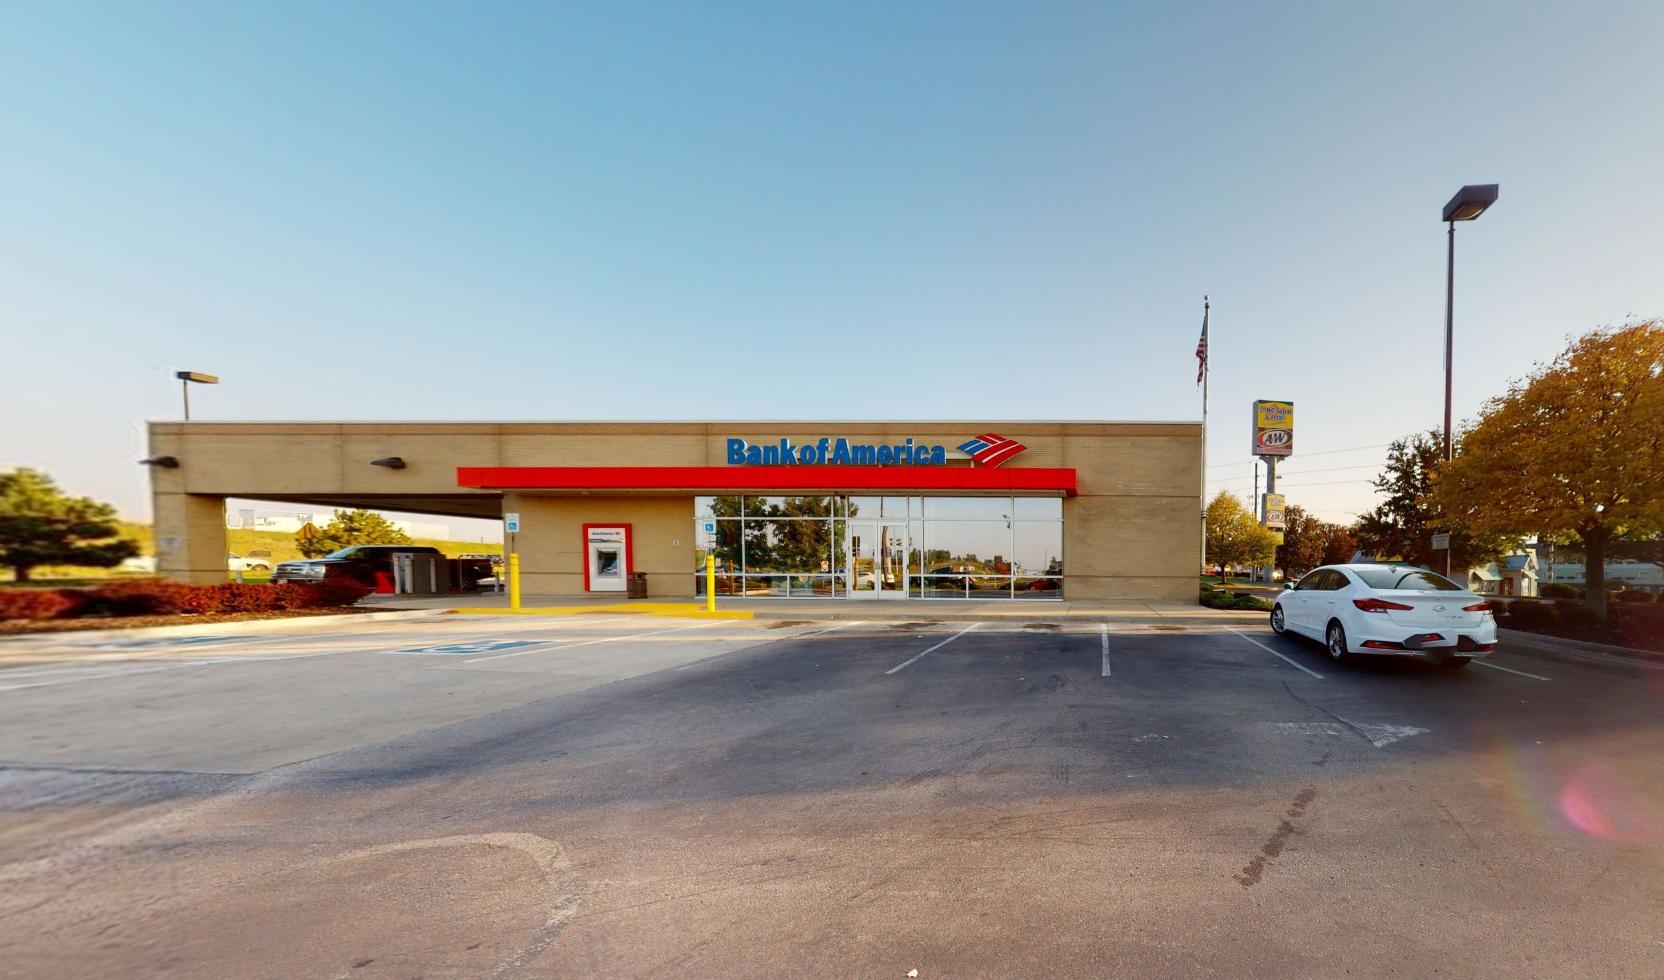 Bank of America financial center with drive-thru ATM   8351 NW Prairie View Rd, Kansas City, MO 64151